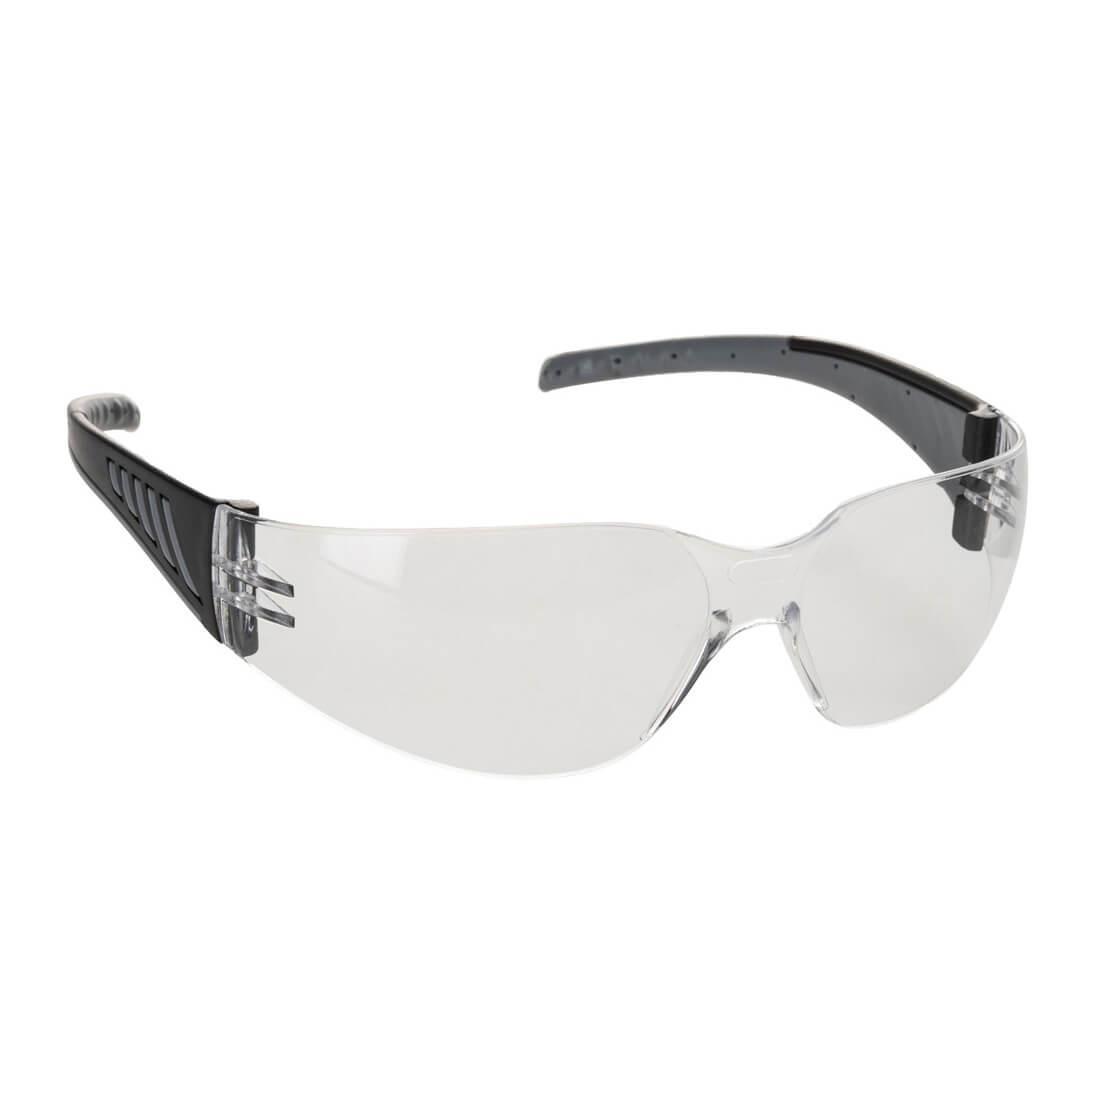 Ochelari Wrap Aroud Pro - Echipamente de protectie personala